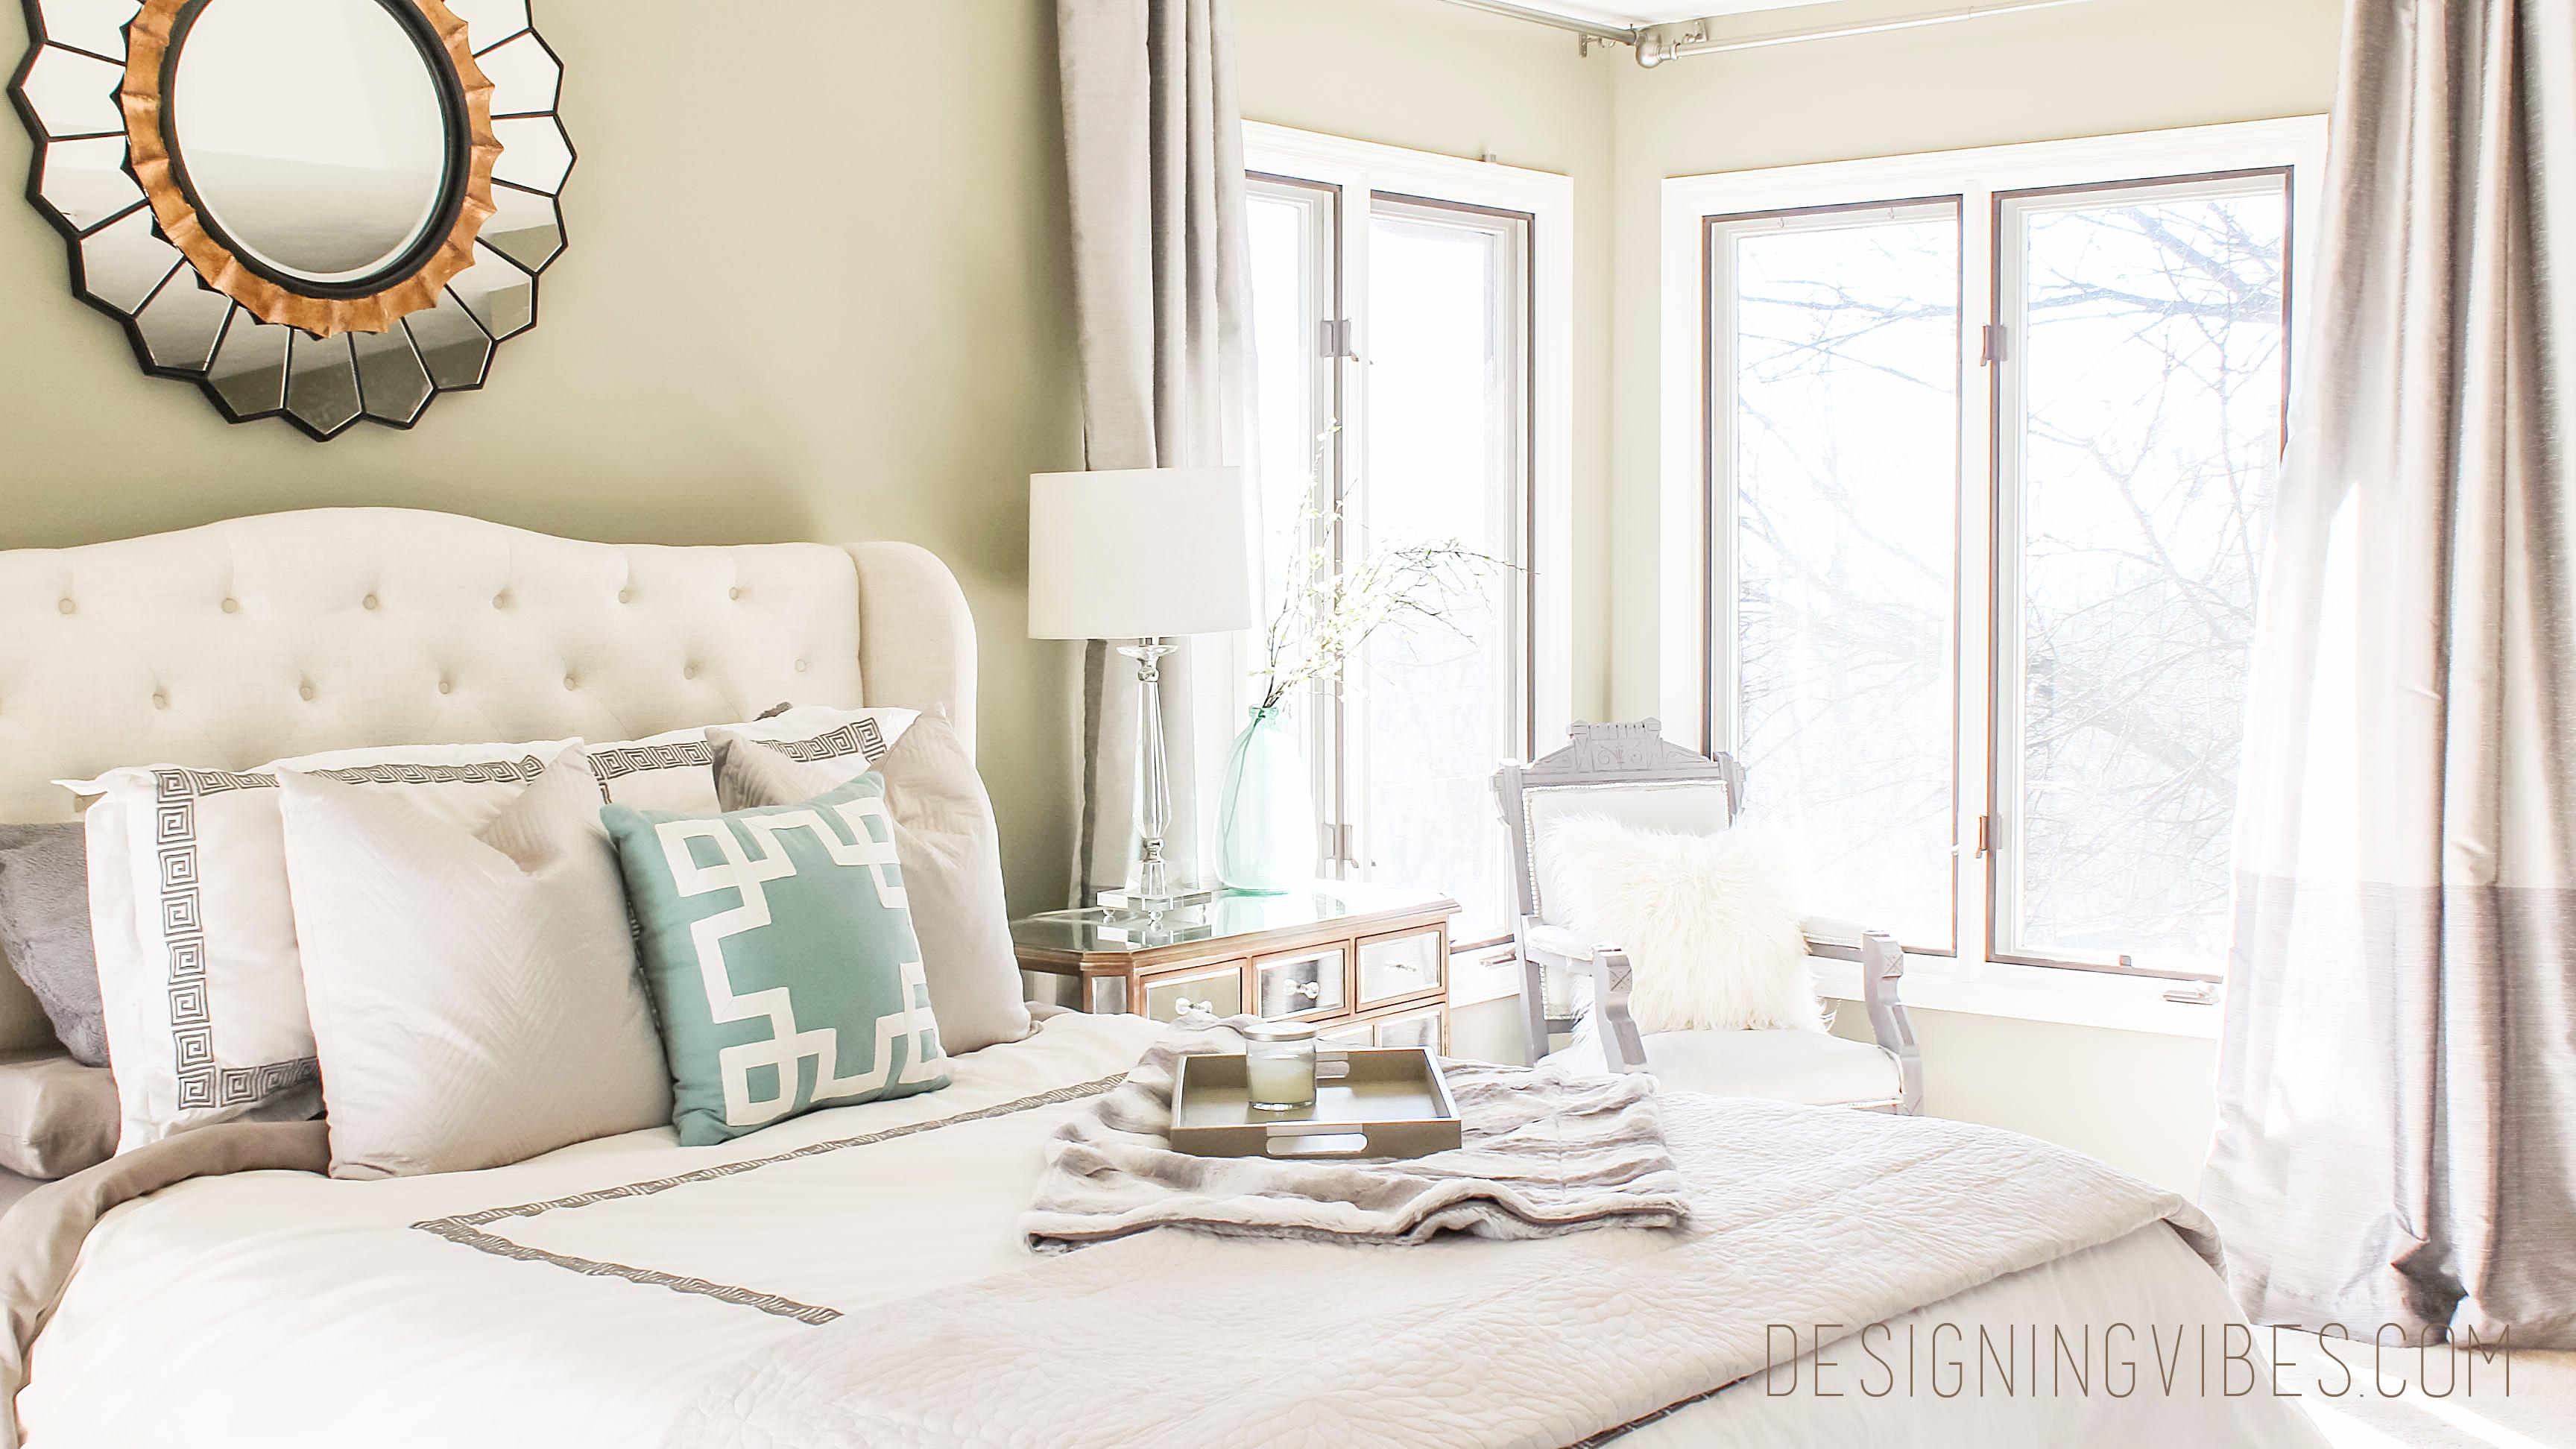 Designing Romantic Vibes In The Bedroom Interior Design